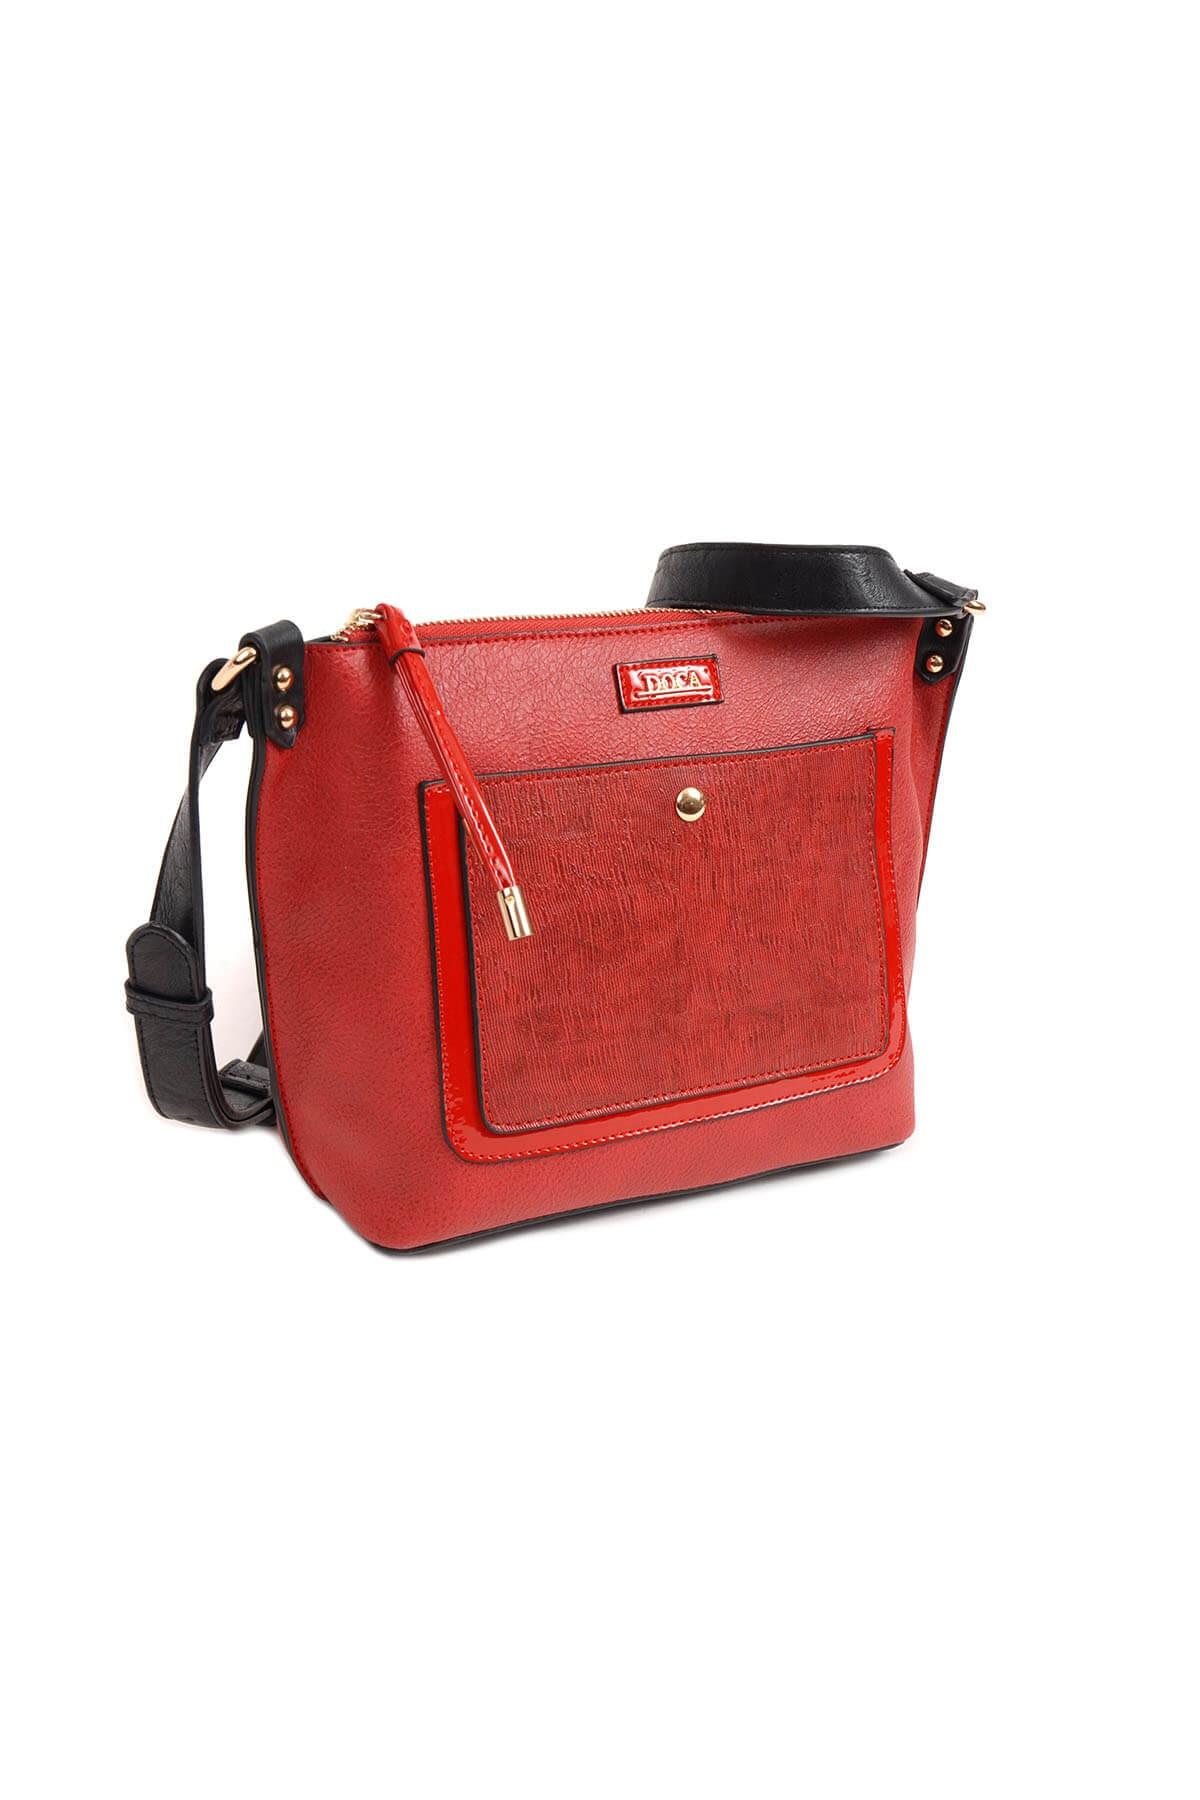 Dámska crossbody kabelka Doca 13949 - červená